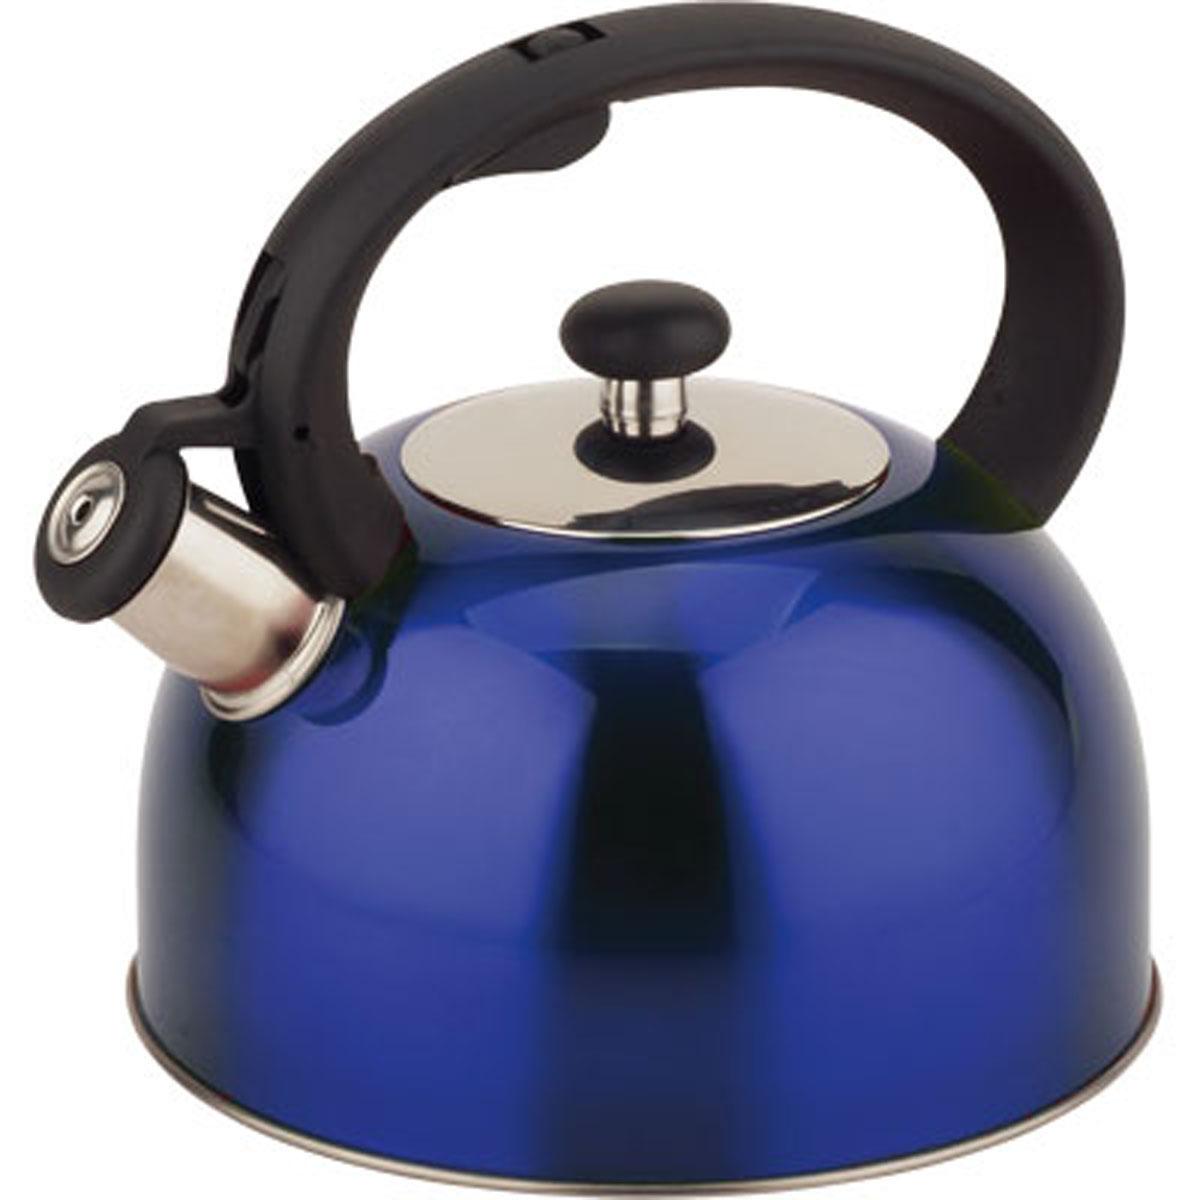 Bohmann чайник BHL-876 3,5л876 - BHLЧайник мет. BHL-876 3,5л (х12)